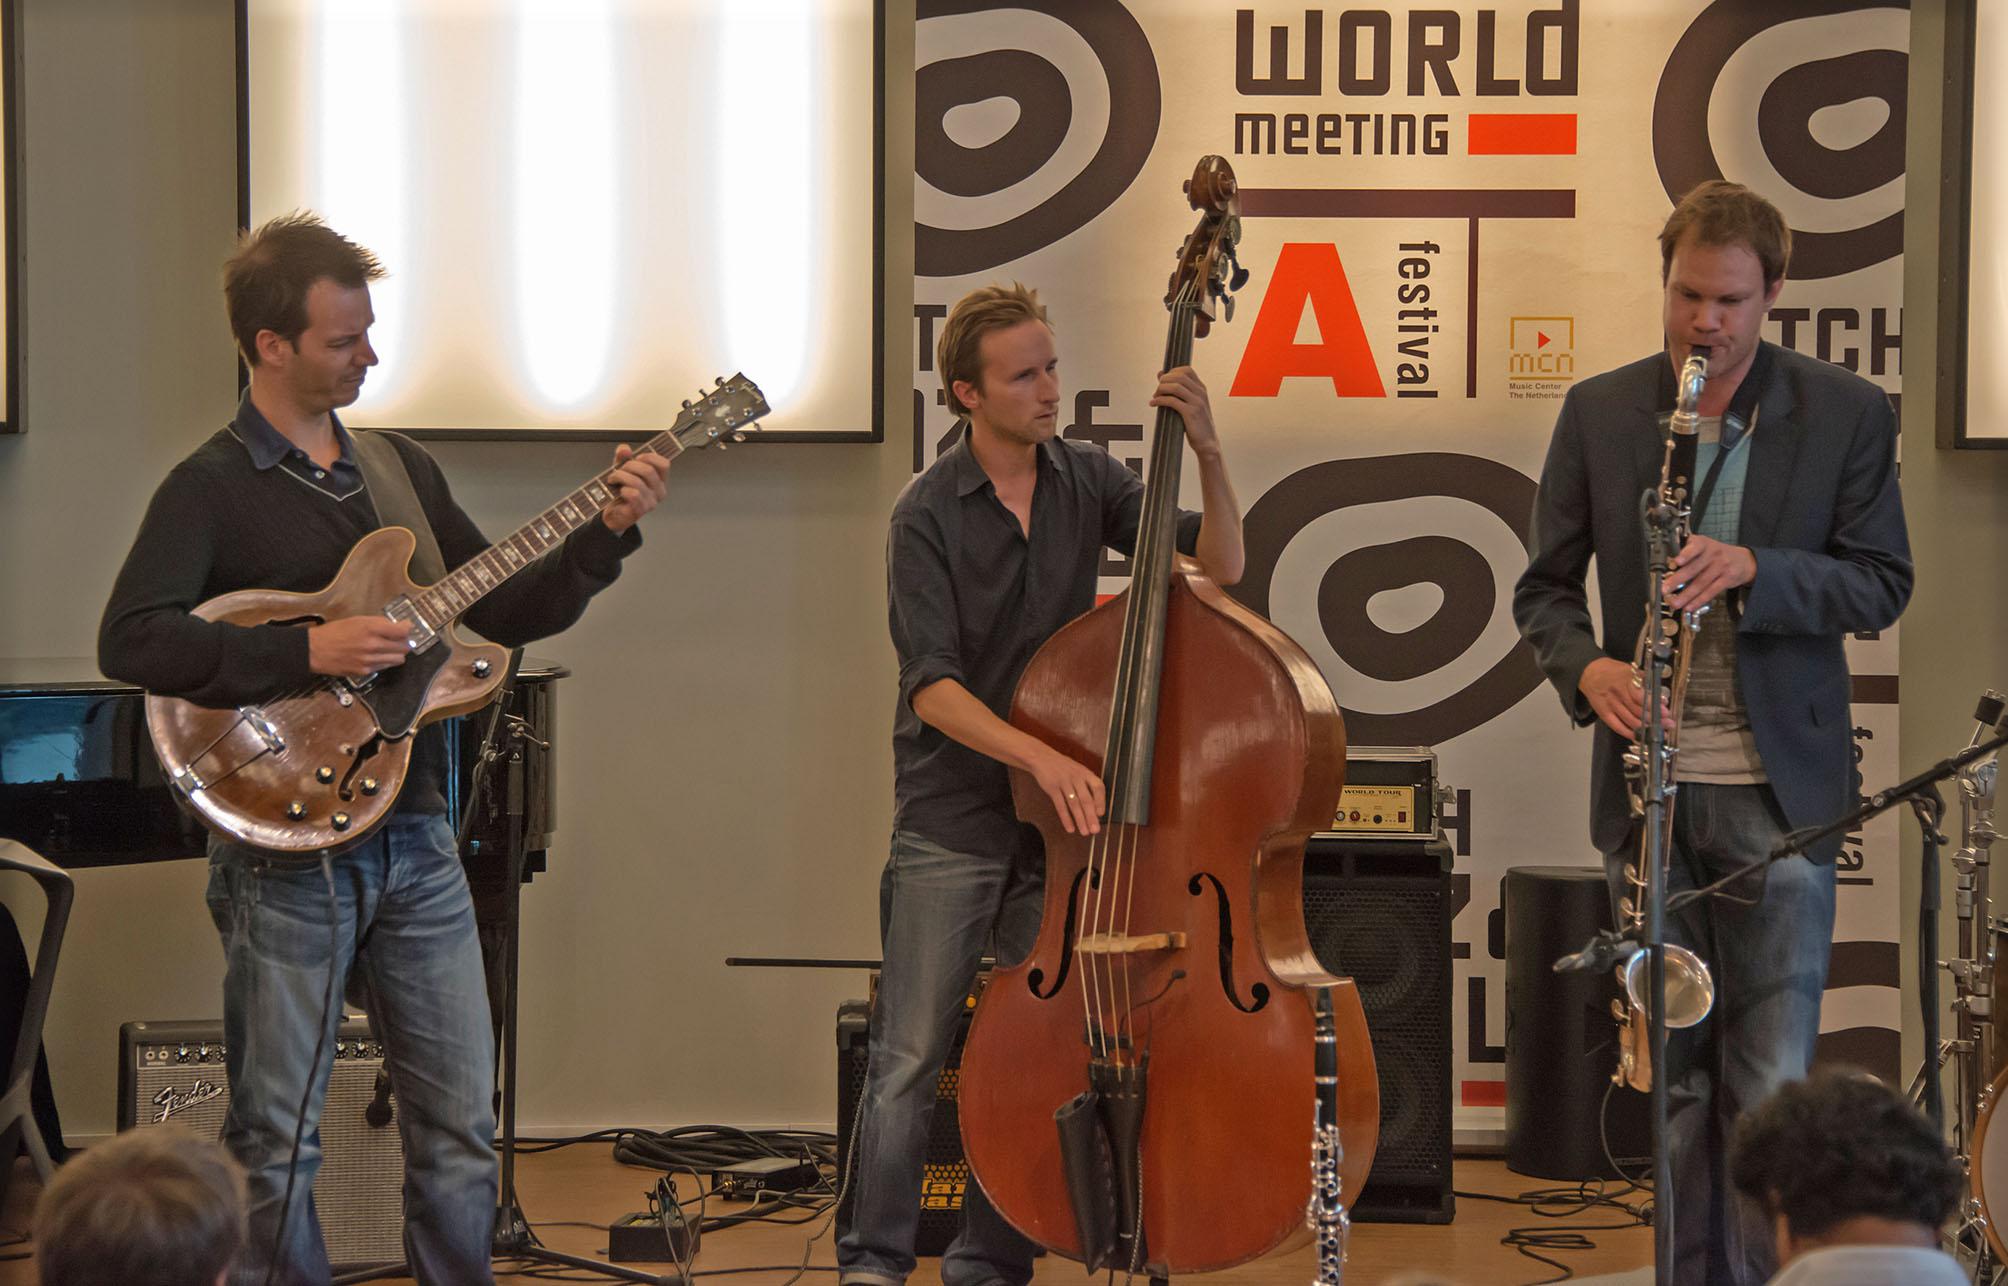 Chambertones at Dutch Jazz & World Meeting 2012